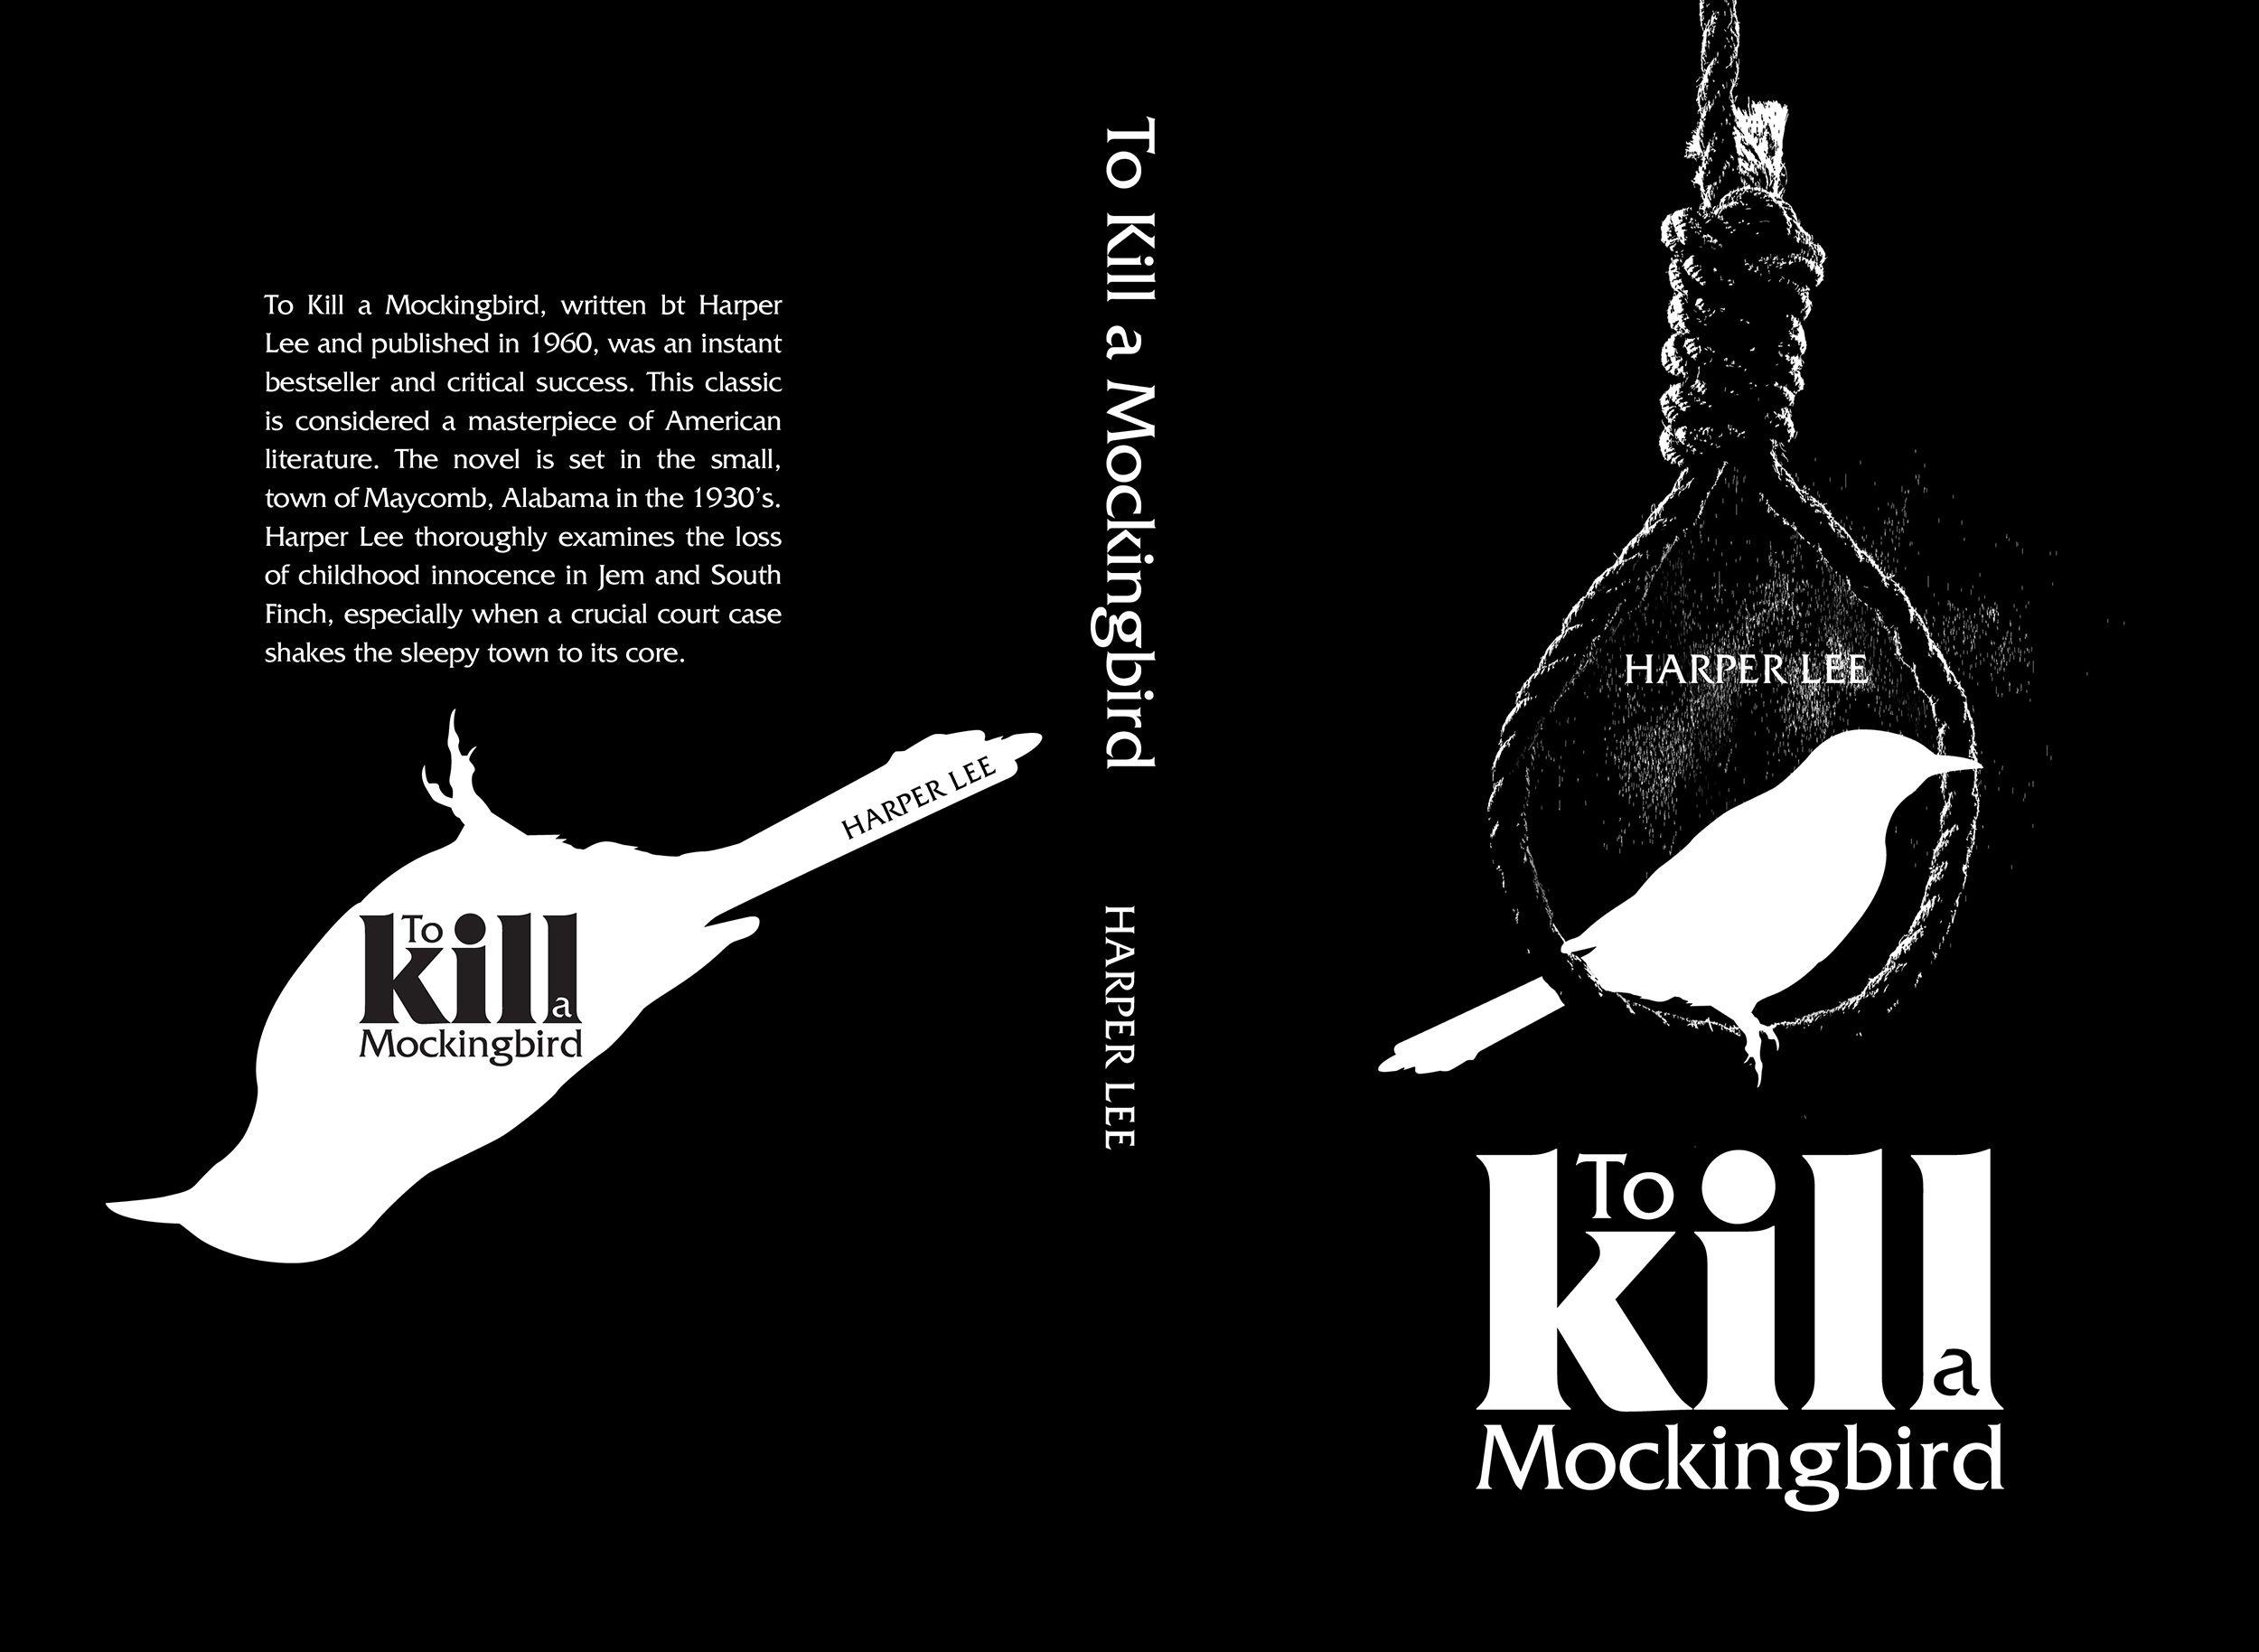 To Kill A Mocking Bird Book Covers To Kill A Mocking Bird